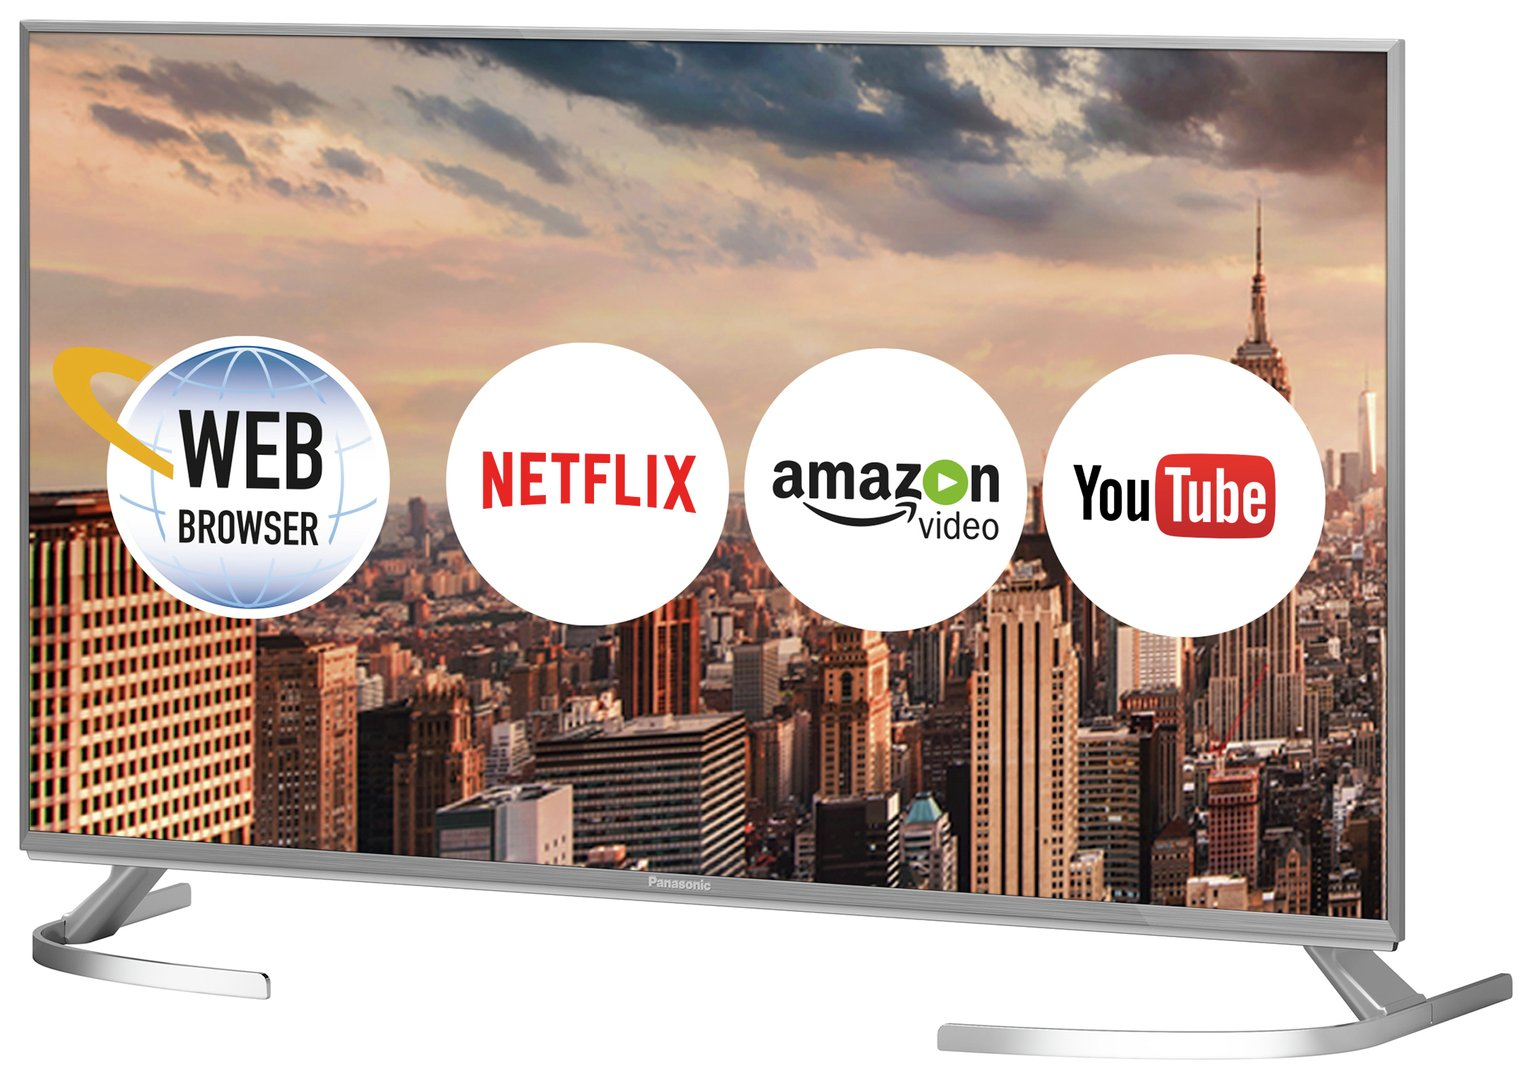 Panasonic 40TX-40EX700B 40 Inch Smart 4K UHD TV with HDR.